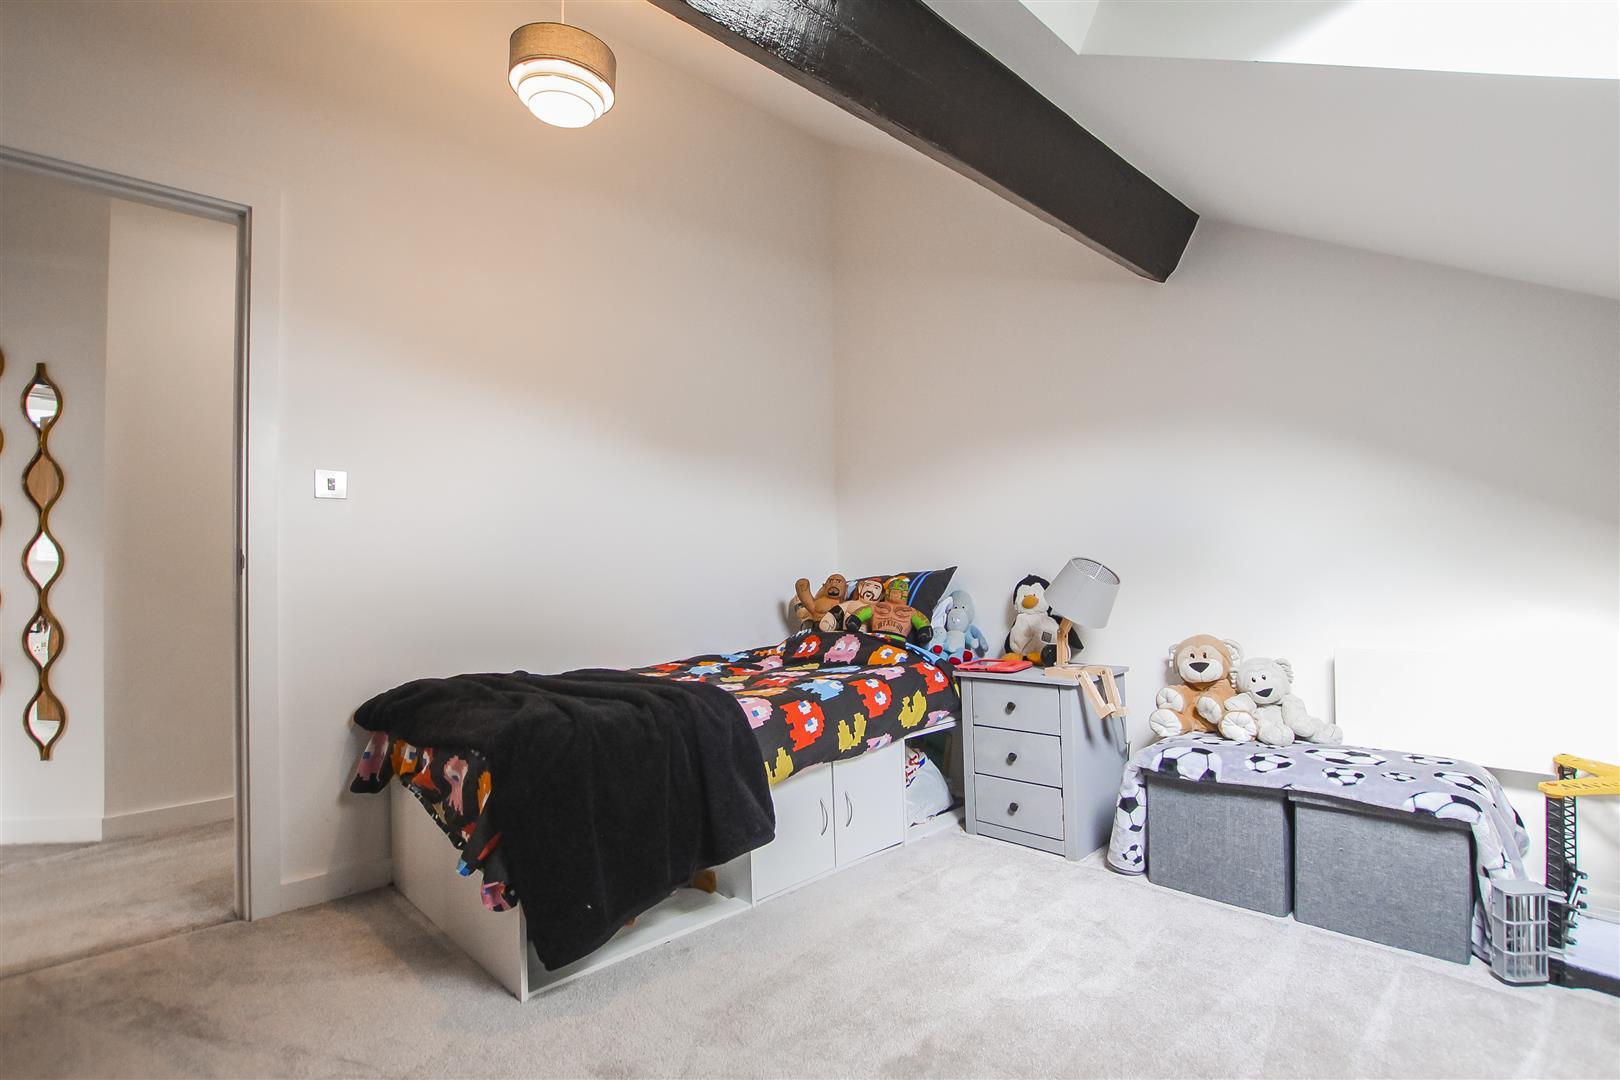 3 Bedroom Duplex Apartment For Sale - Image 52